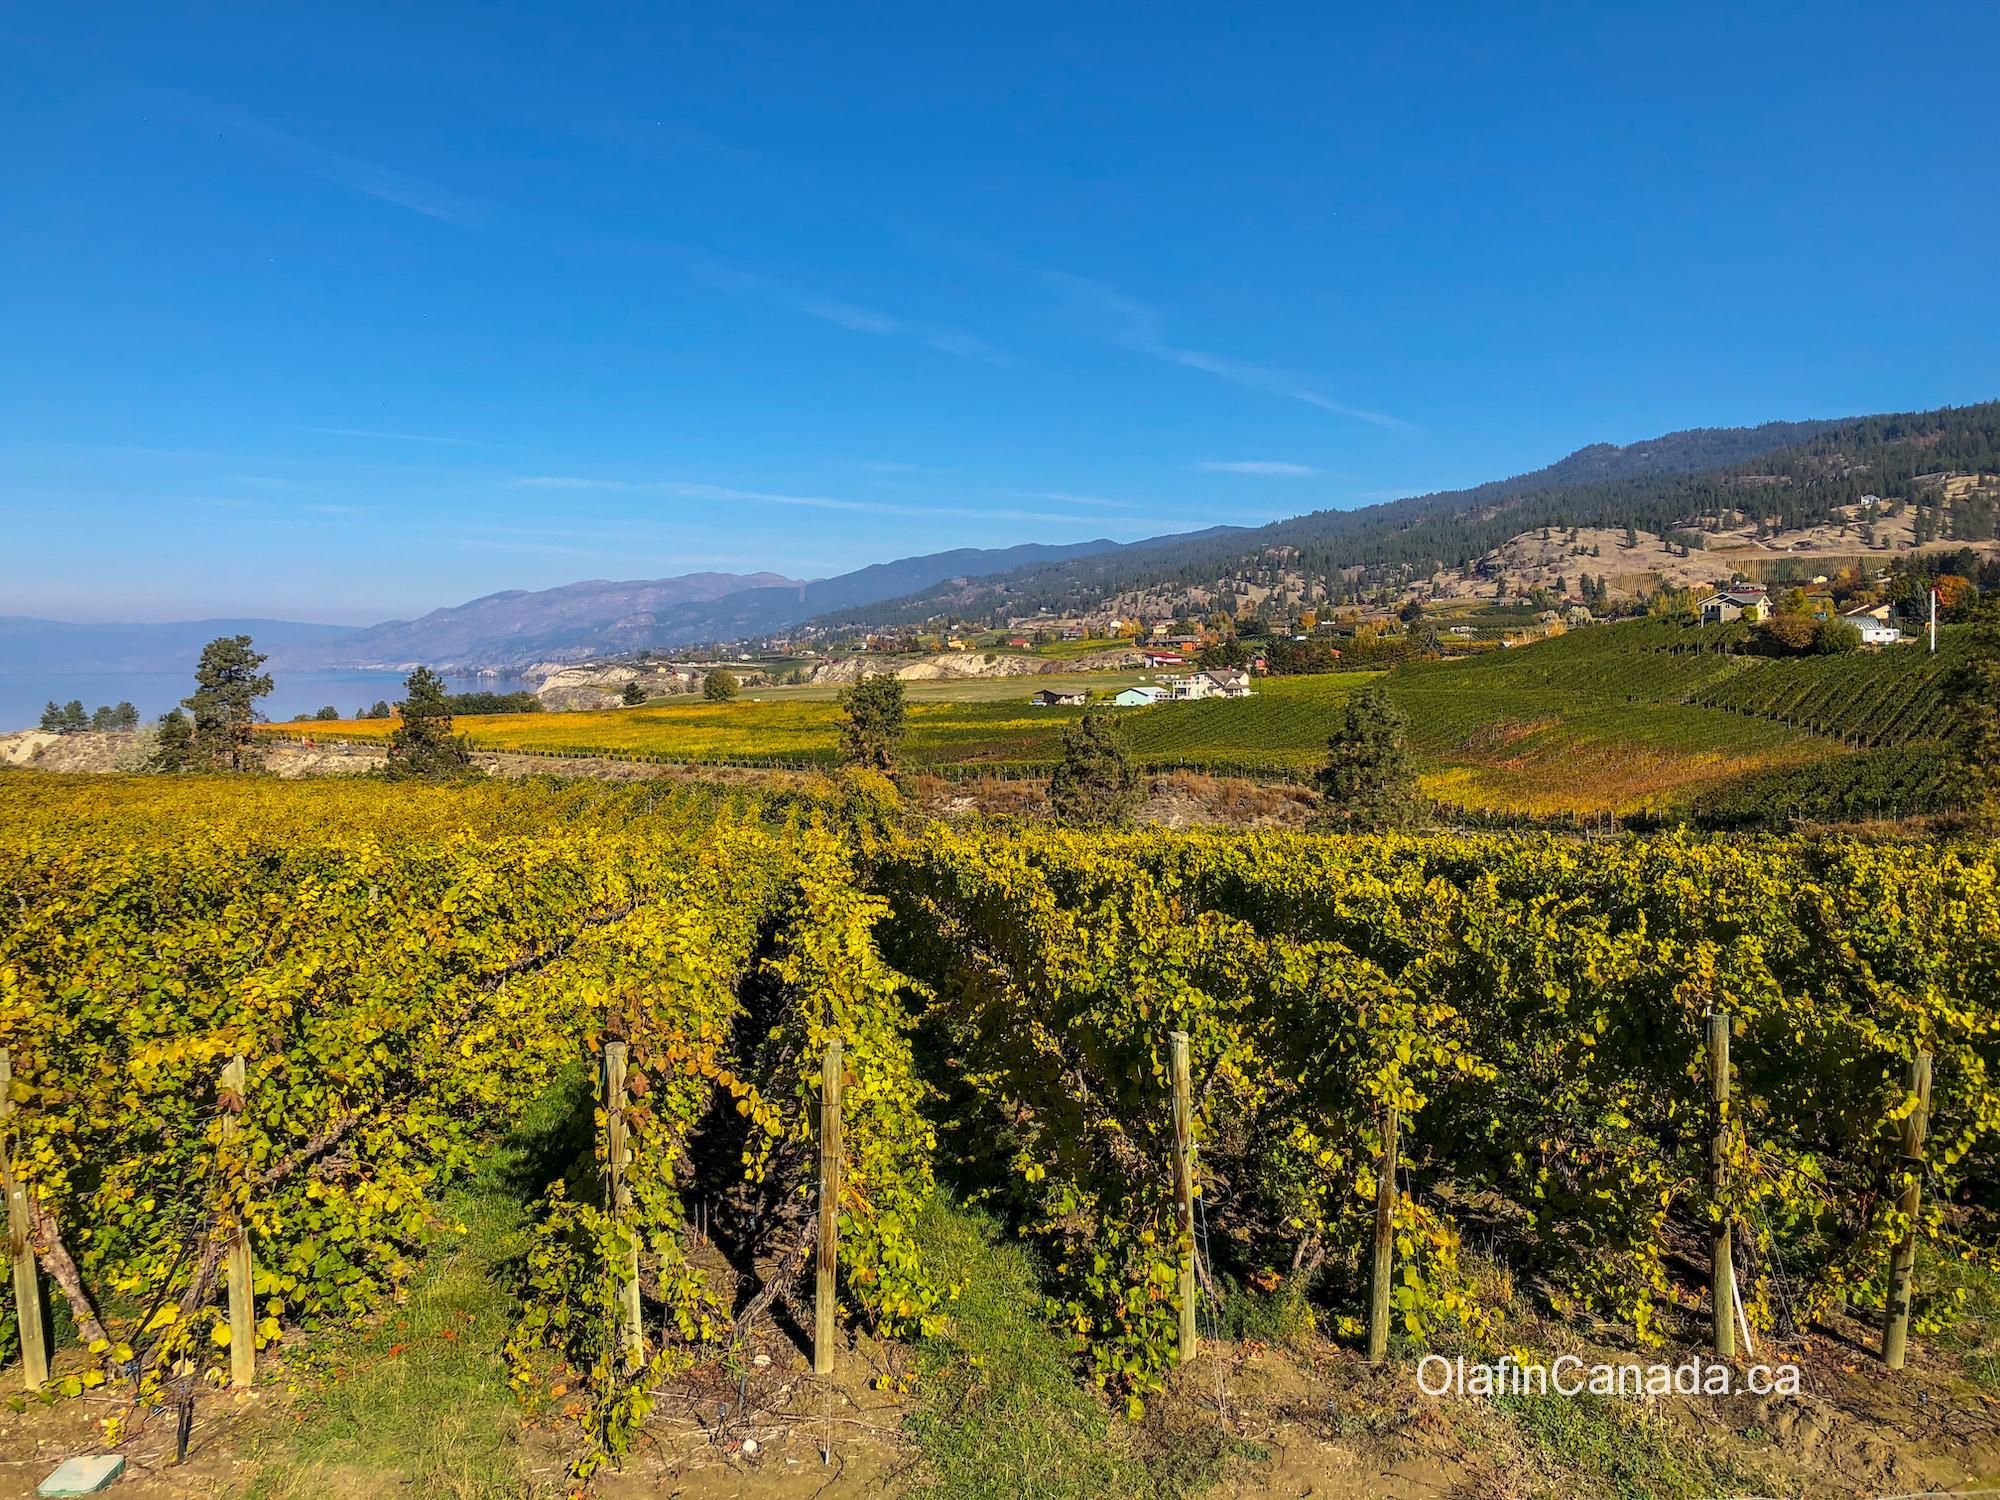 Vines in Naramata in the Okanagan Valley and Lake #olafincanada #britishcolumbia #discoverbc #okanaganvalley #naramata #wine